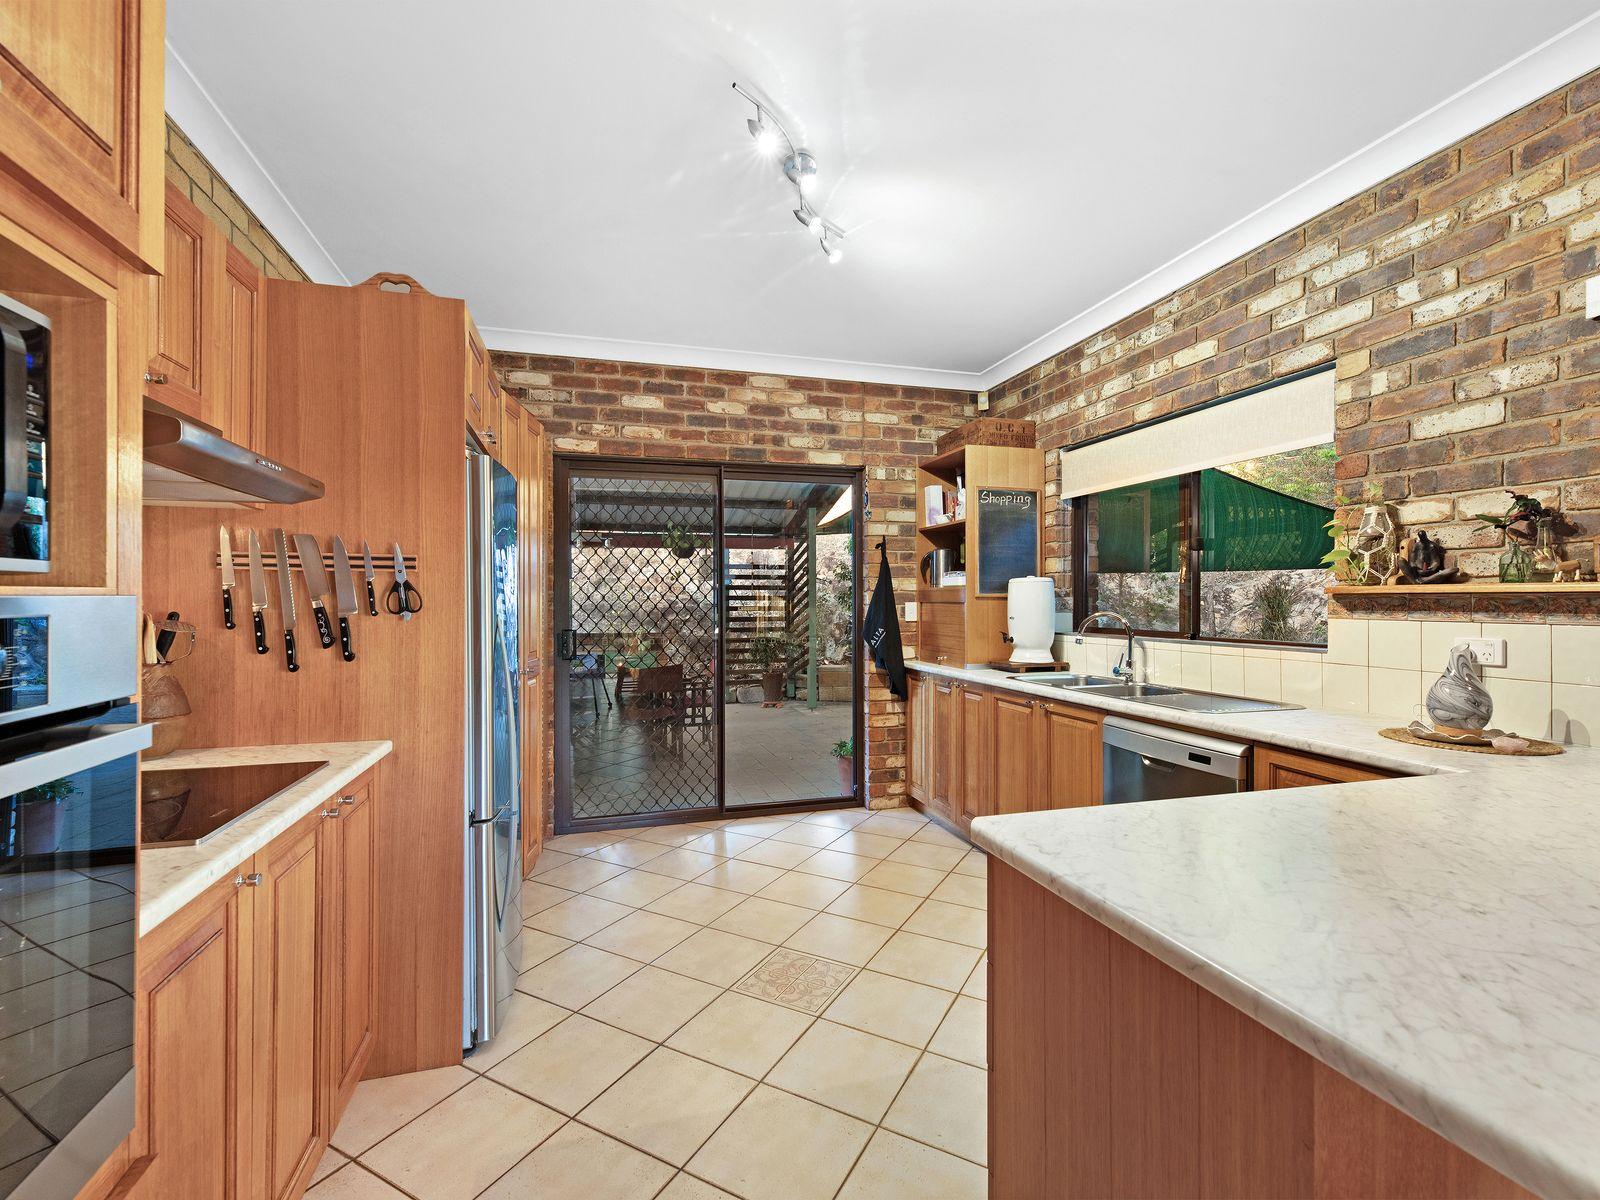 14 Kerr Court, Brassall, QLD 4305